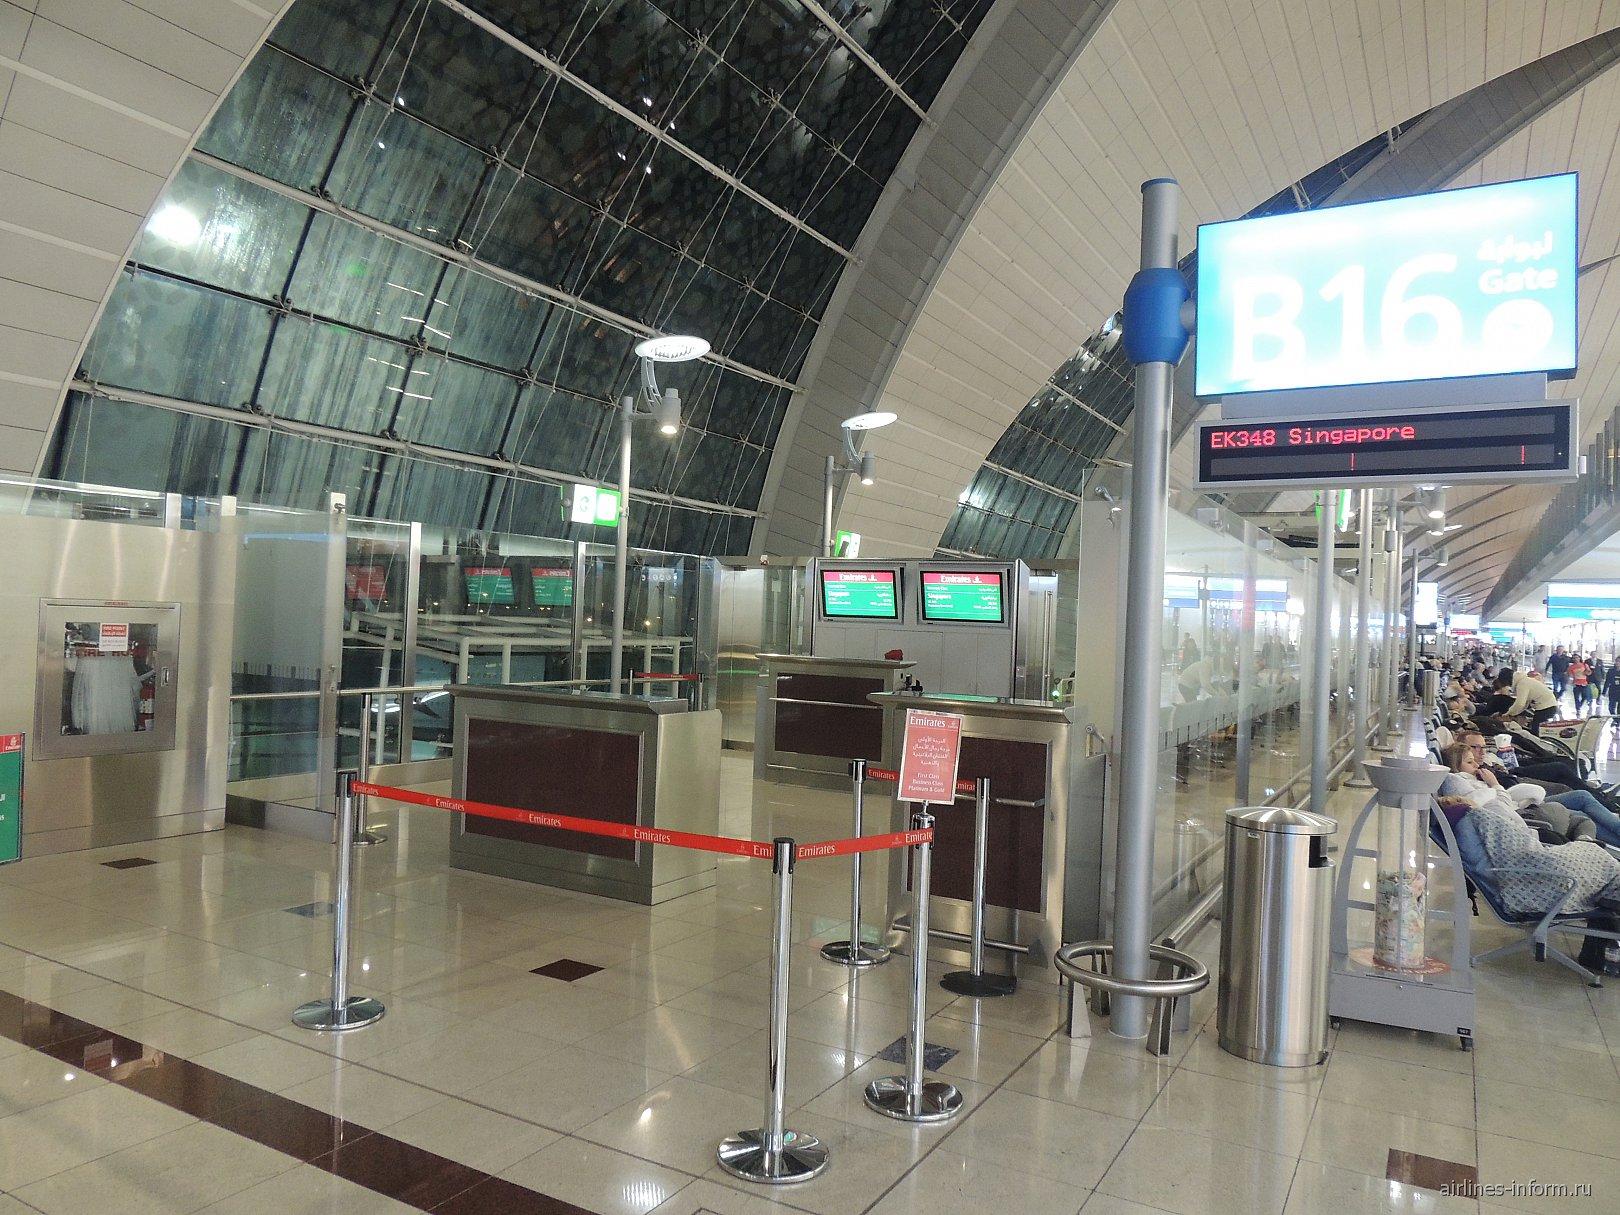 Выход на посадку в аэропорту Дубай